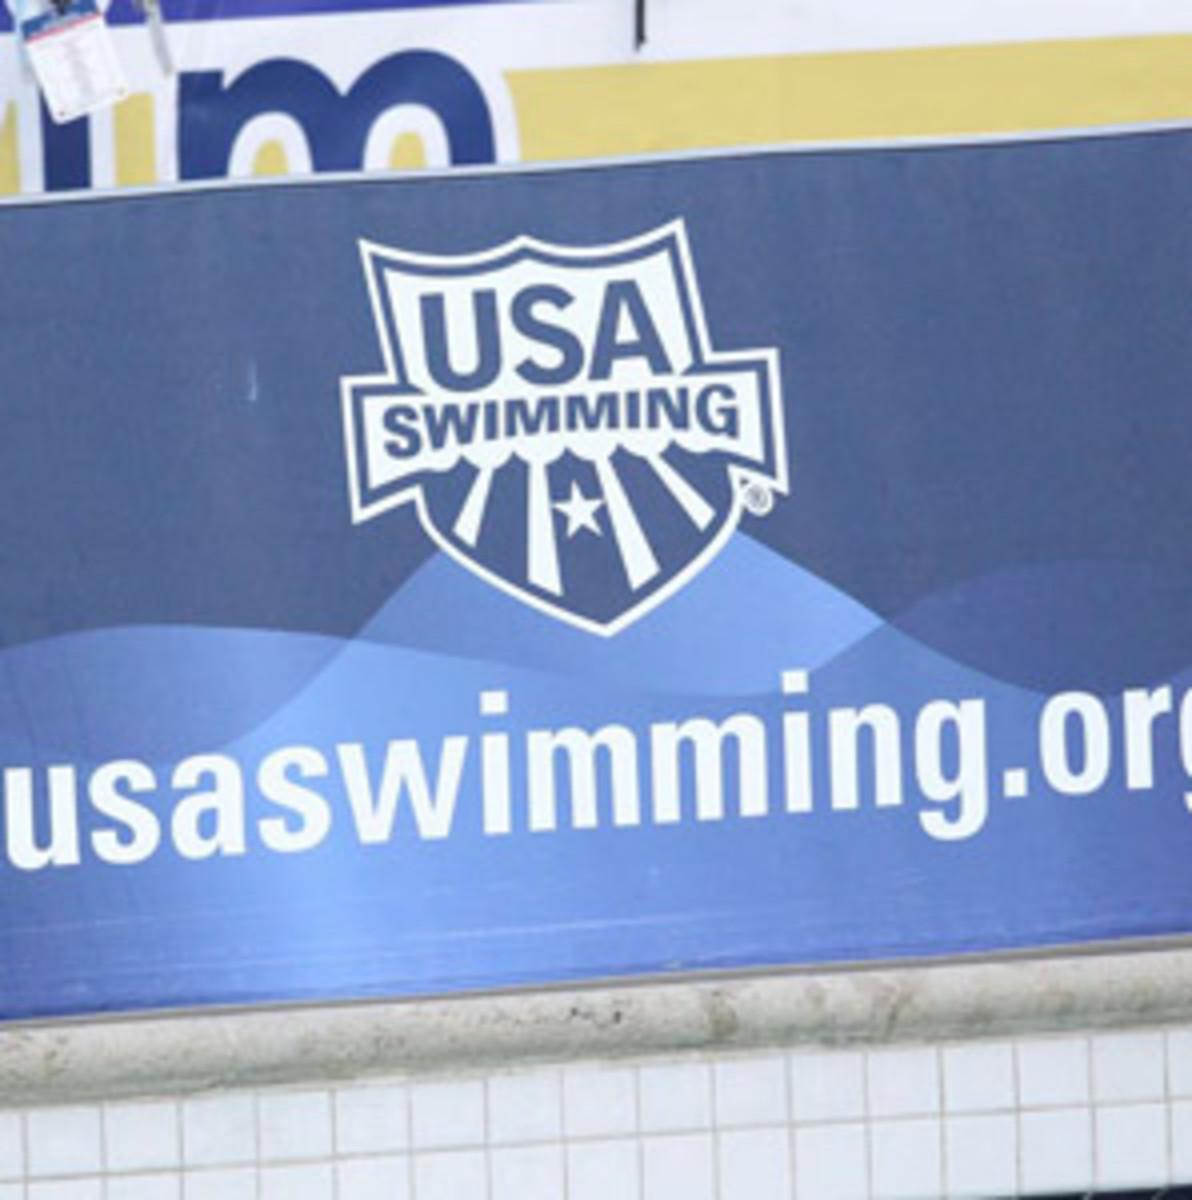 130524012554-usaswimming-logo-052413-single-image-cut.jpg